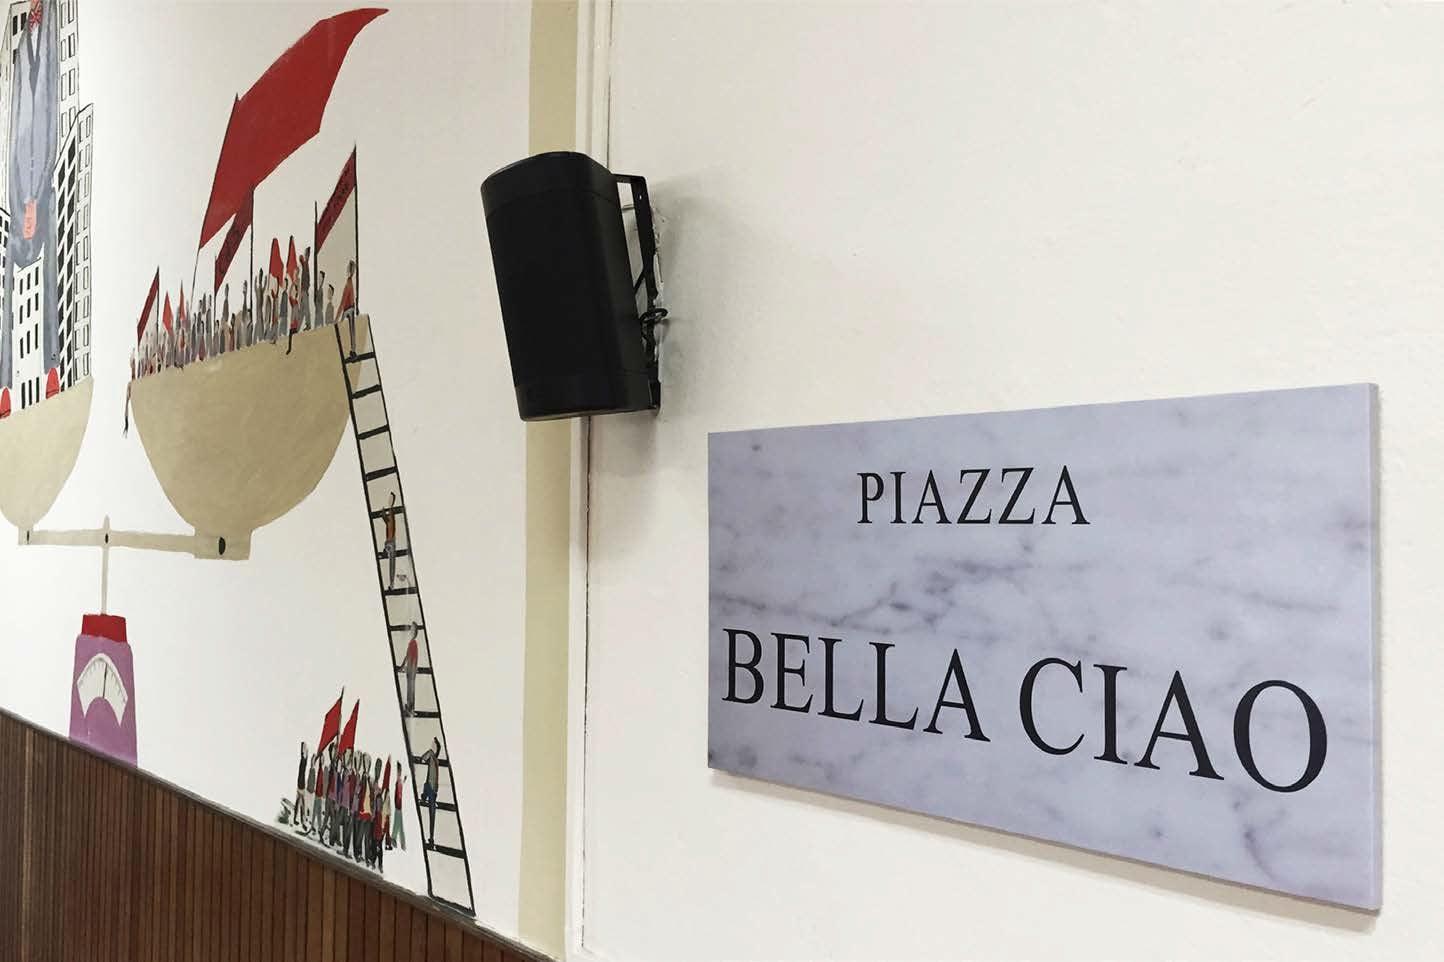 Francesco Garbelli Piazza Bella Ciao 2016